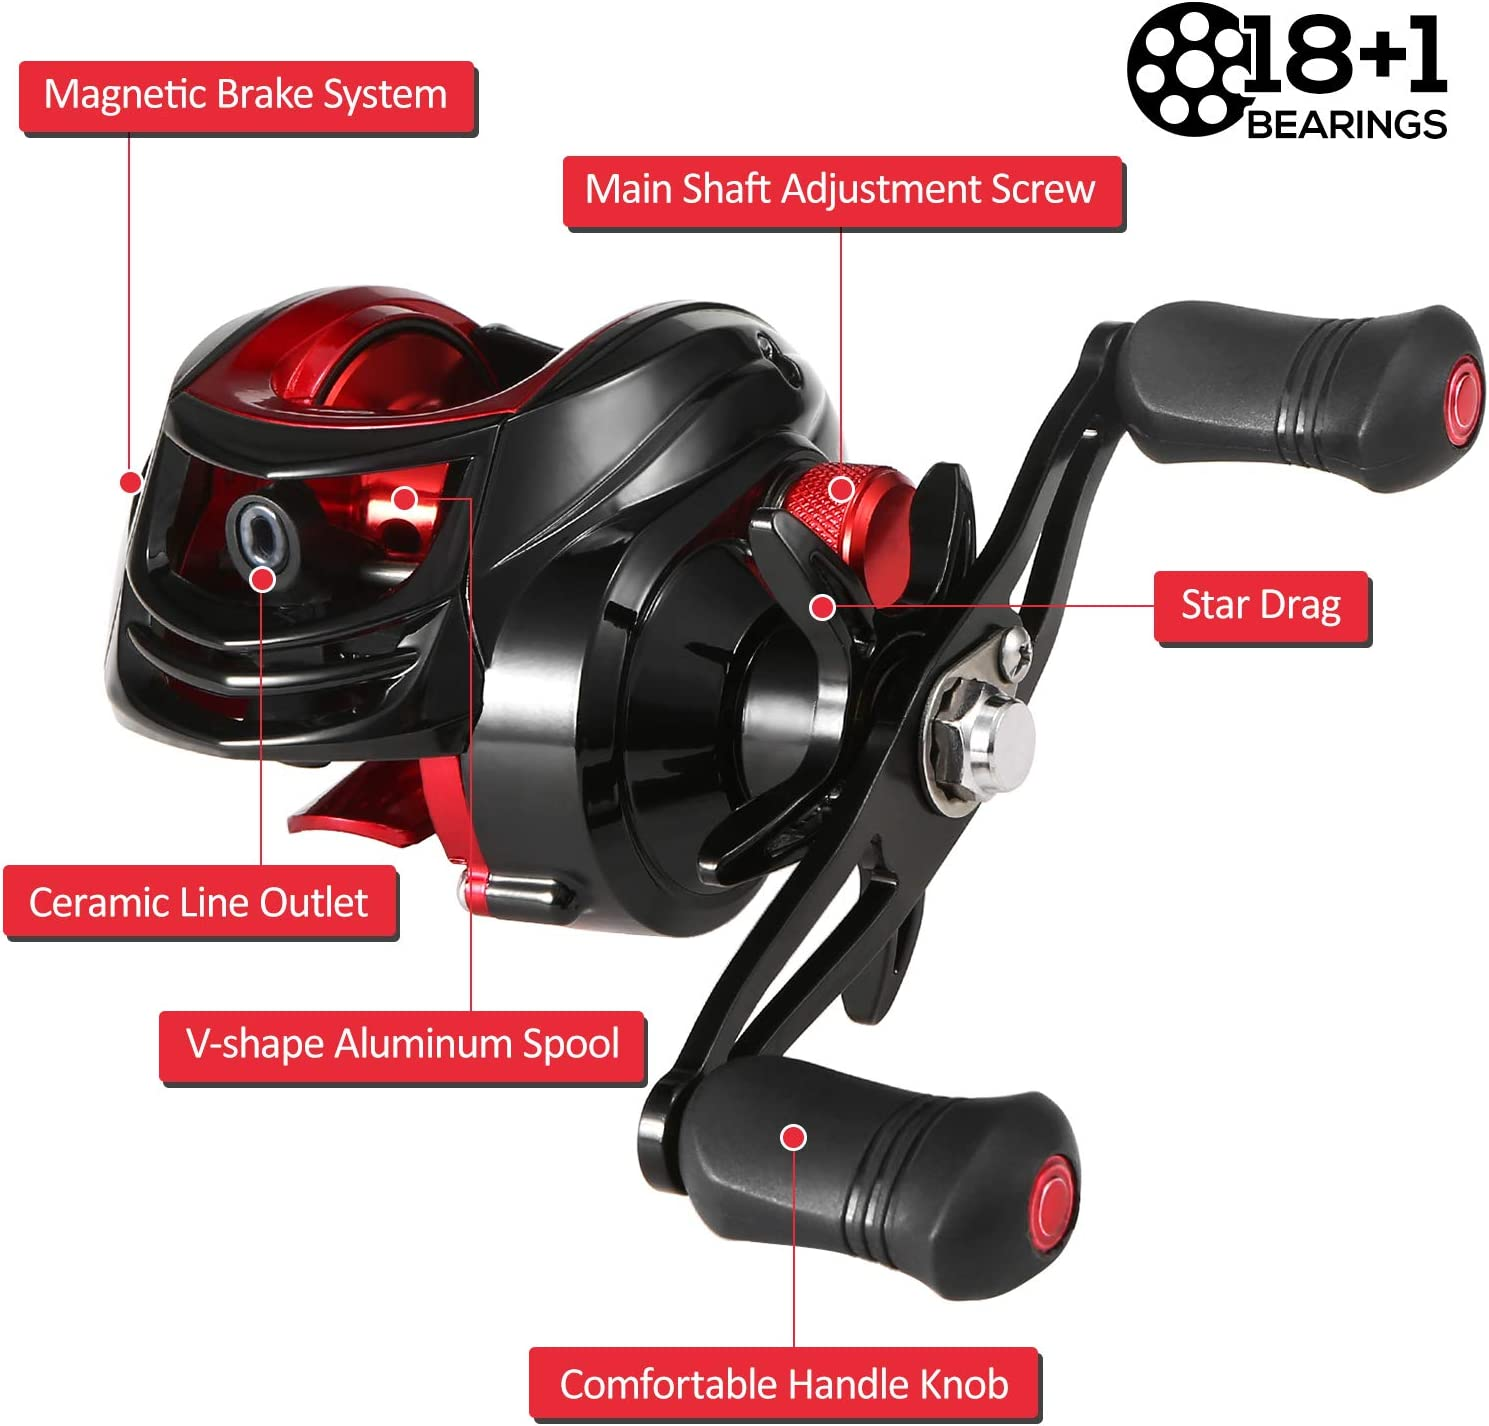 1 Gear Ratio Magnetic Brake System Baitcaster Reel Walmeck Baitcasting Reel 18+1BB Ball Bearings Baitcasting Fishing Reel High Speed 7.2